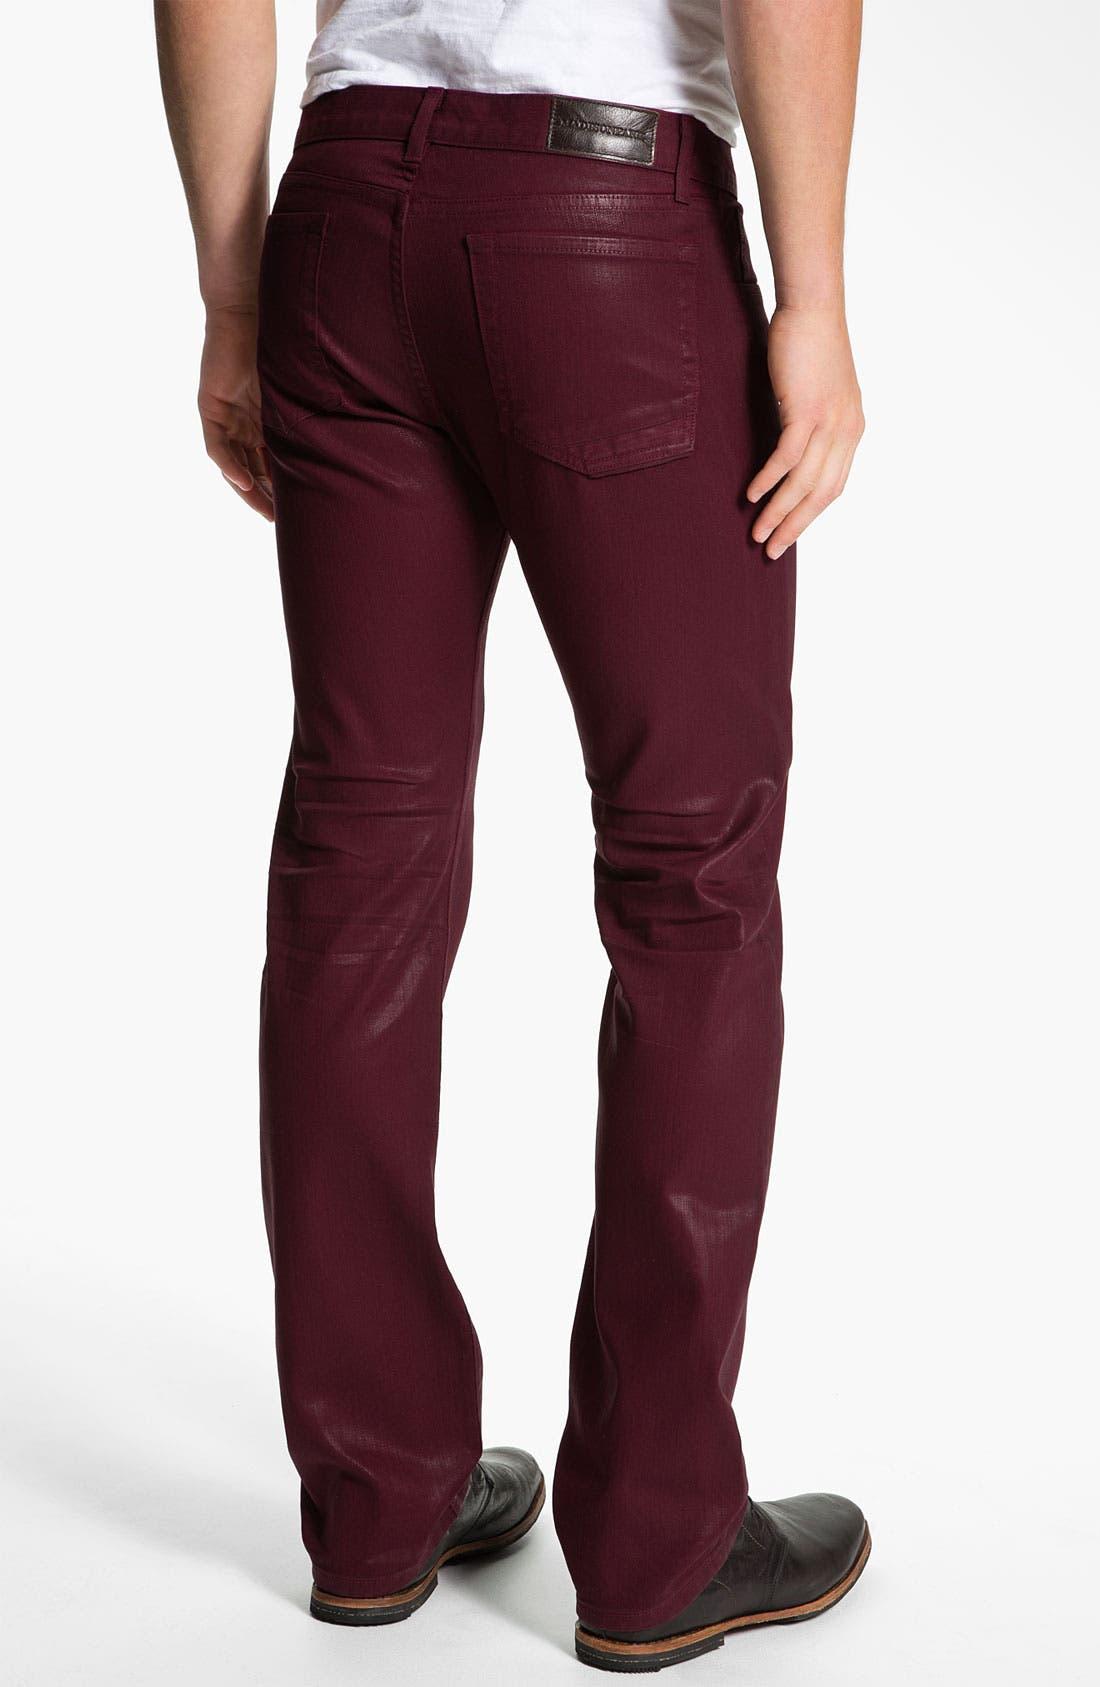 Main Image - Madisonpark Collective 'Miles' Slim Straight Leg Jeans (Merlot)